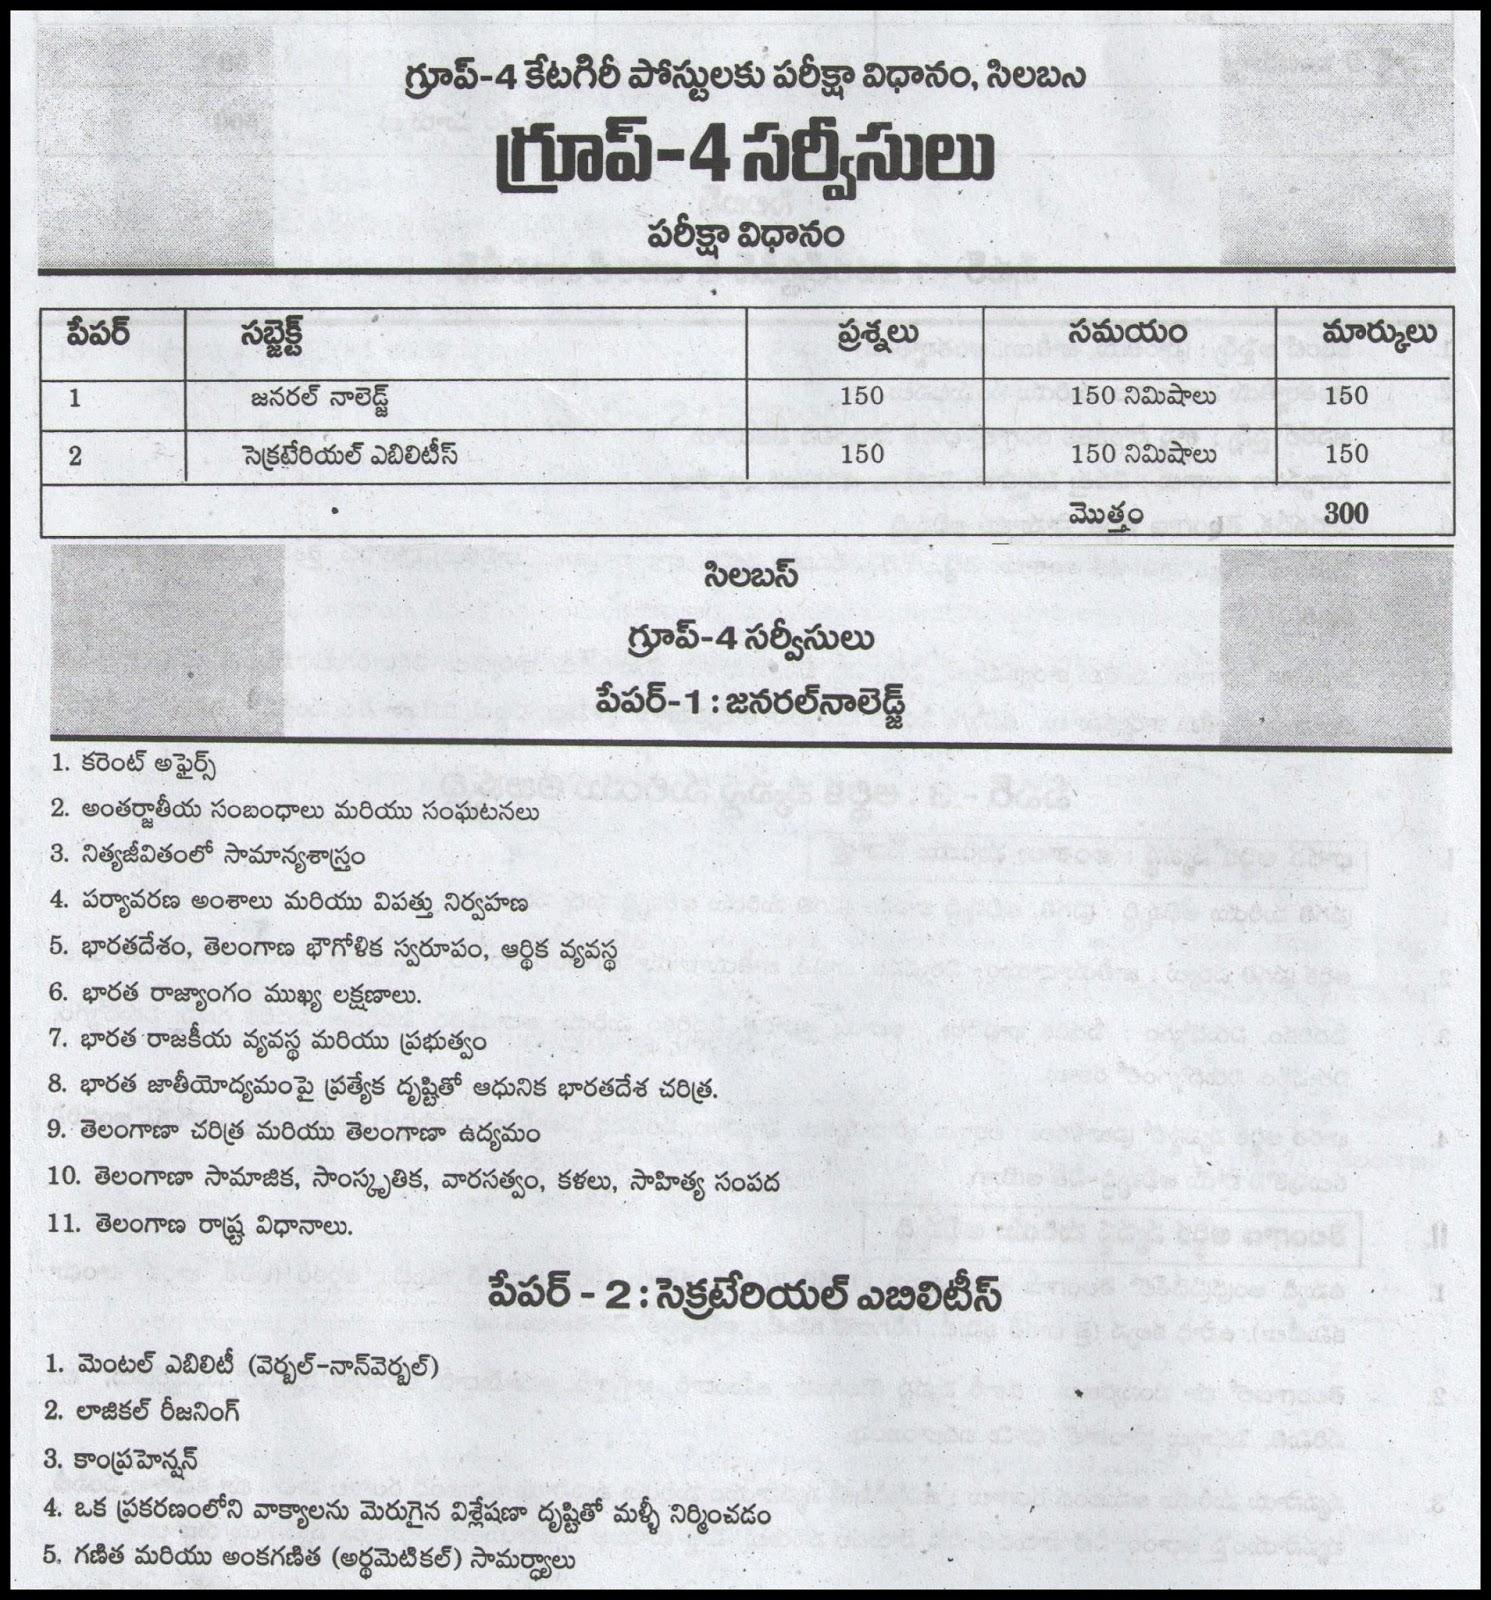 telangana tspsc group 4 exam syllabus in telugu with scheme of exam pattern detailed pattern